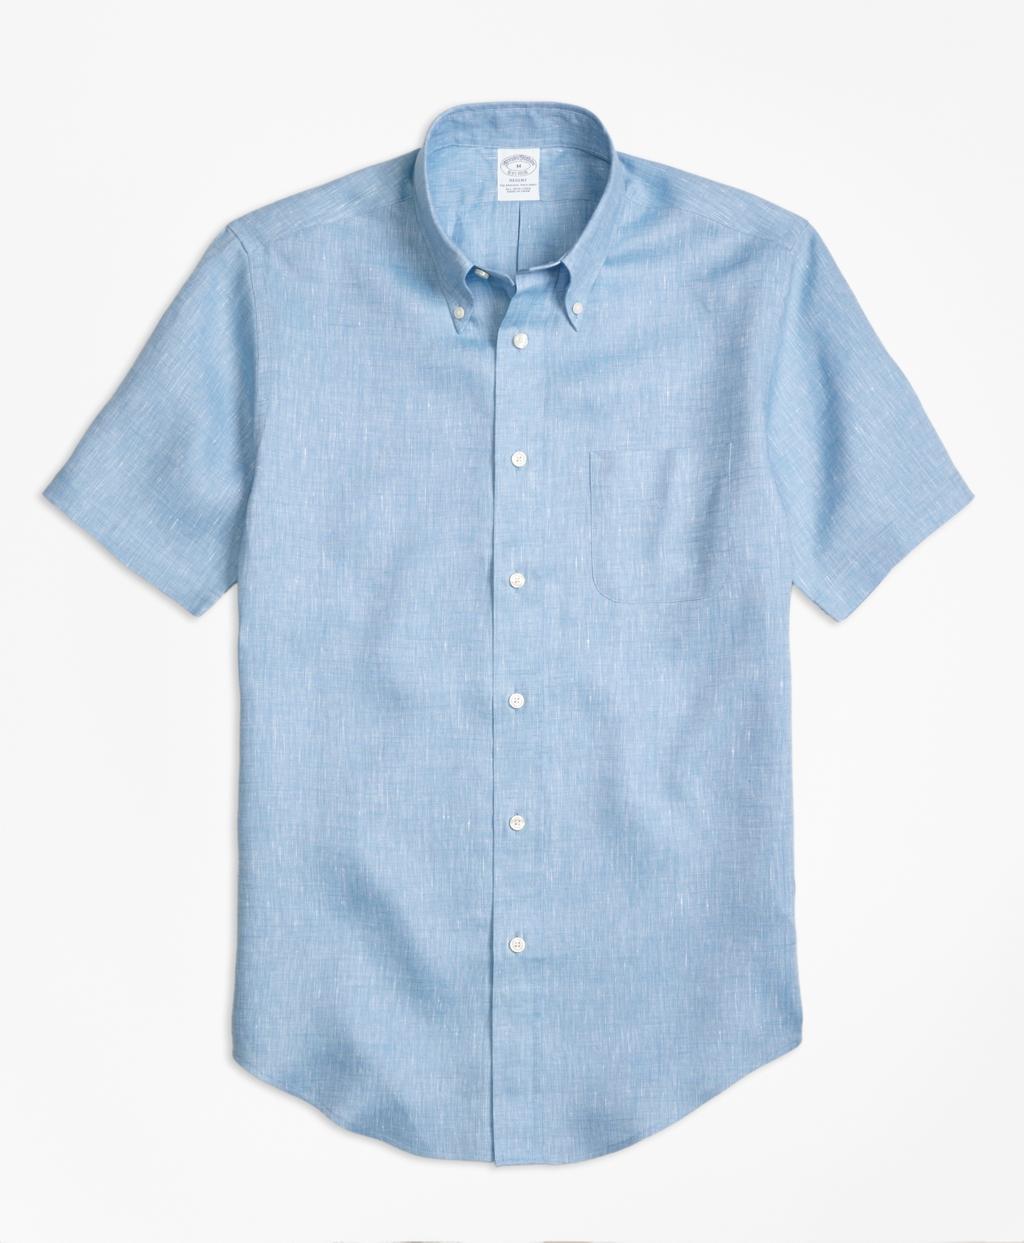 Lyst brooks brothers regent fit irish linen short sleeve for Irish linen dress shirts